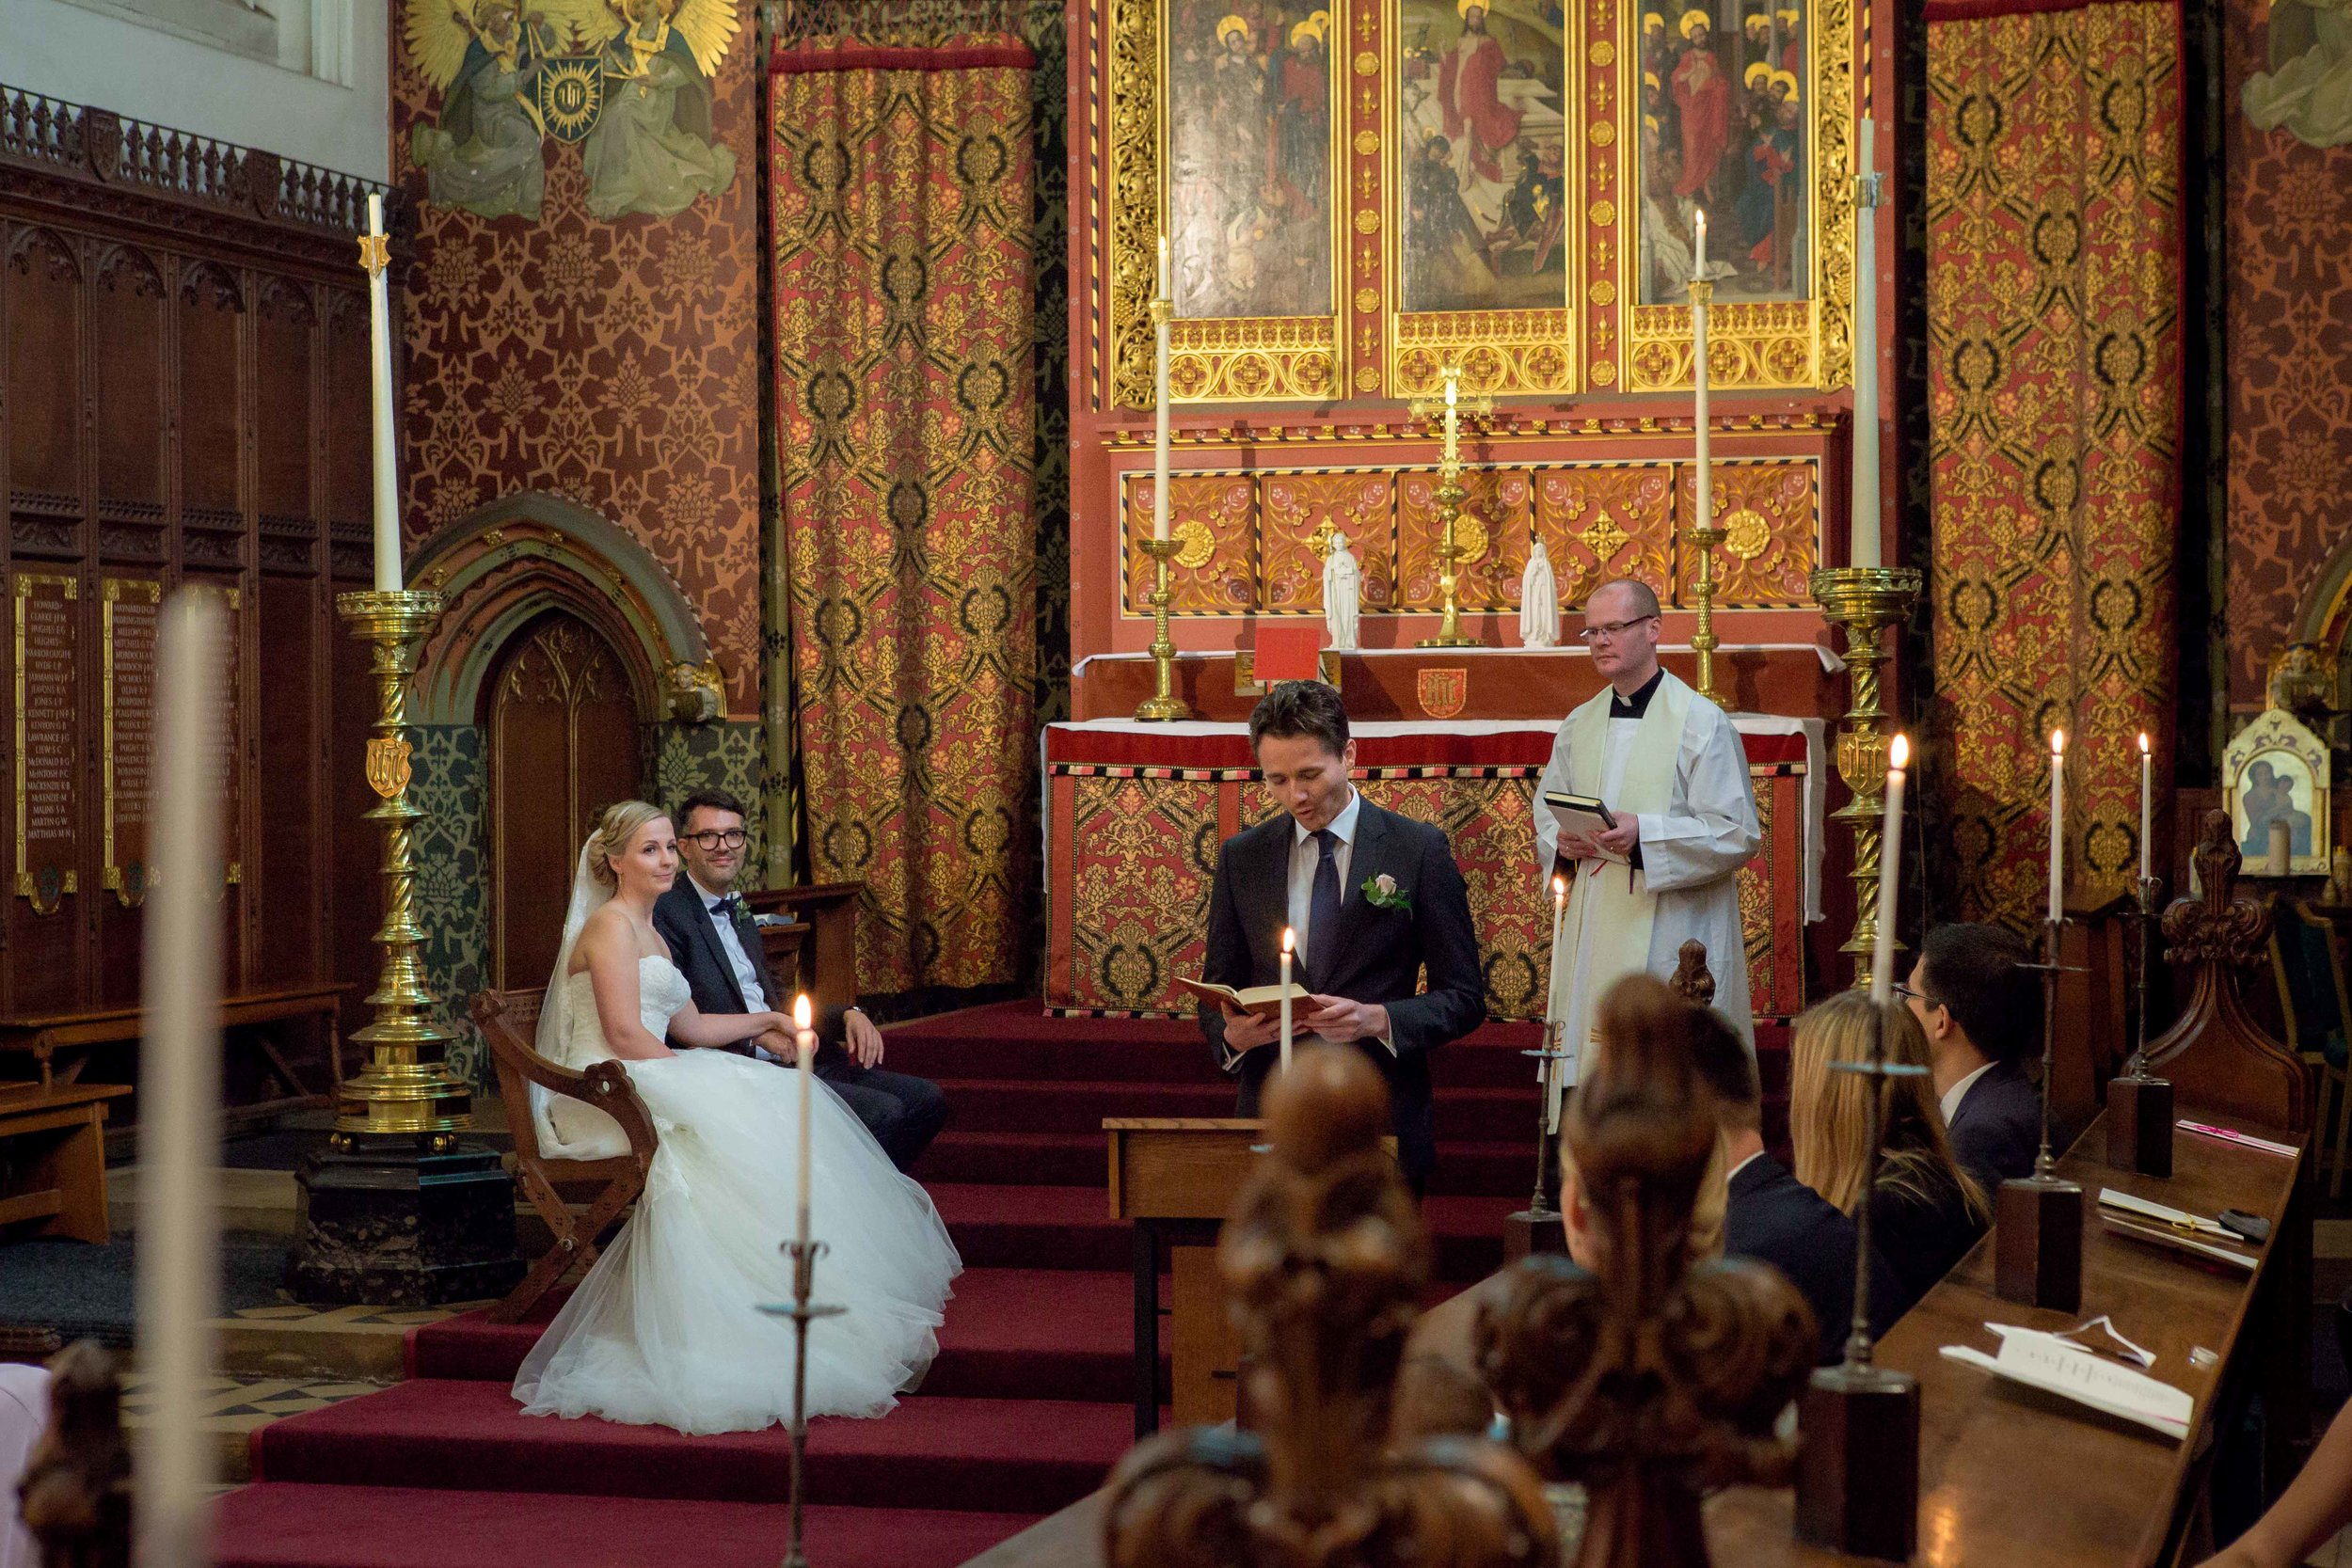 Adrian_Nicole_Charnwood_Weddings_Queens_College_Cambridge-1018.jpg